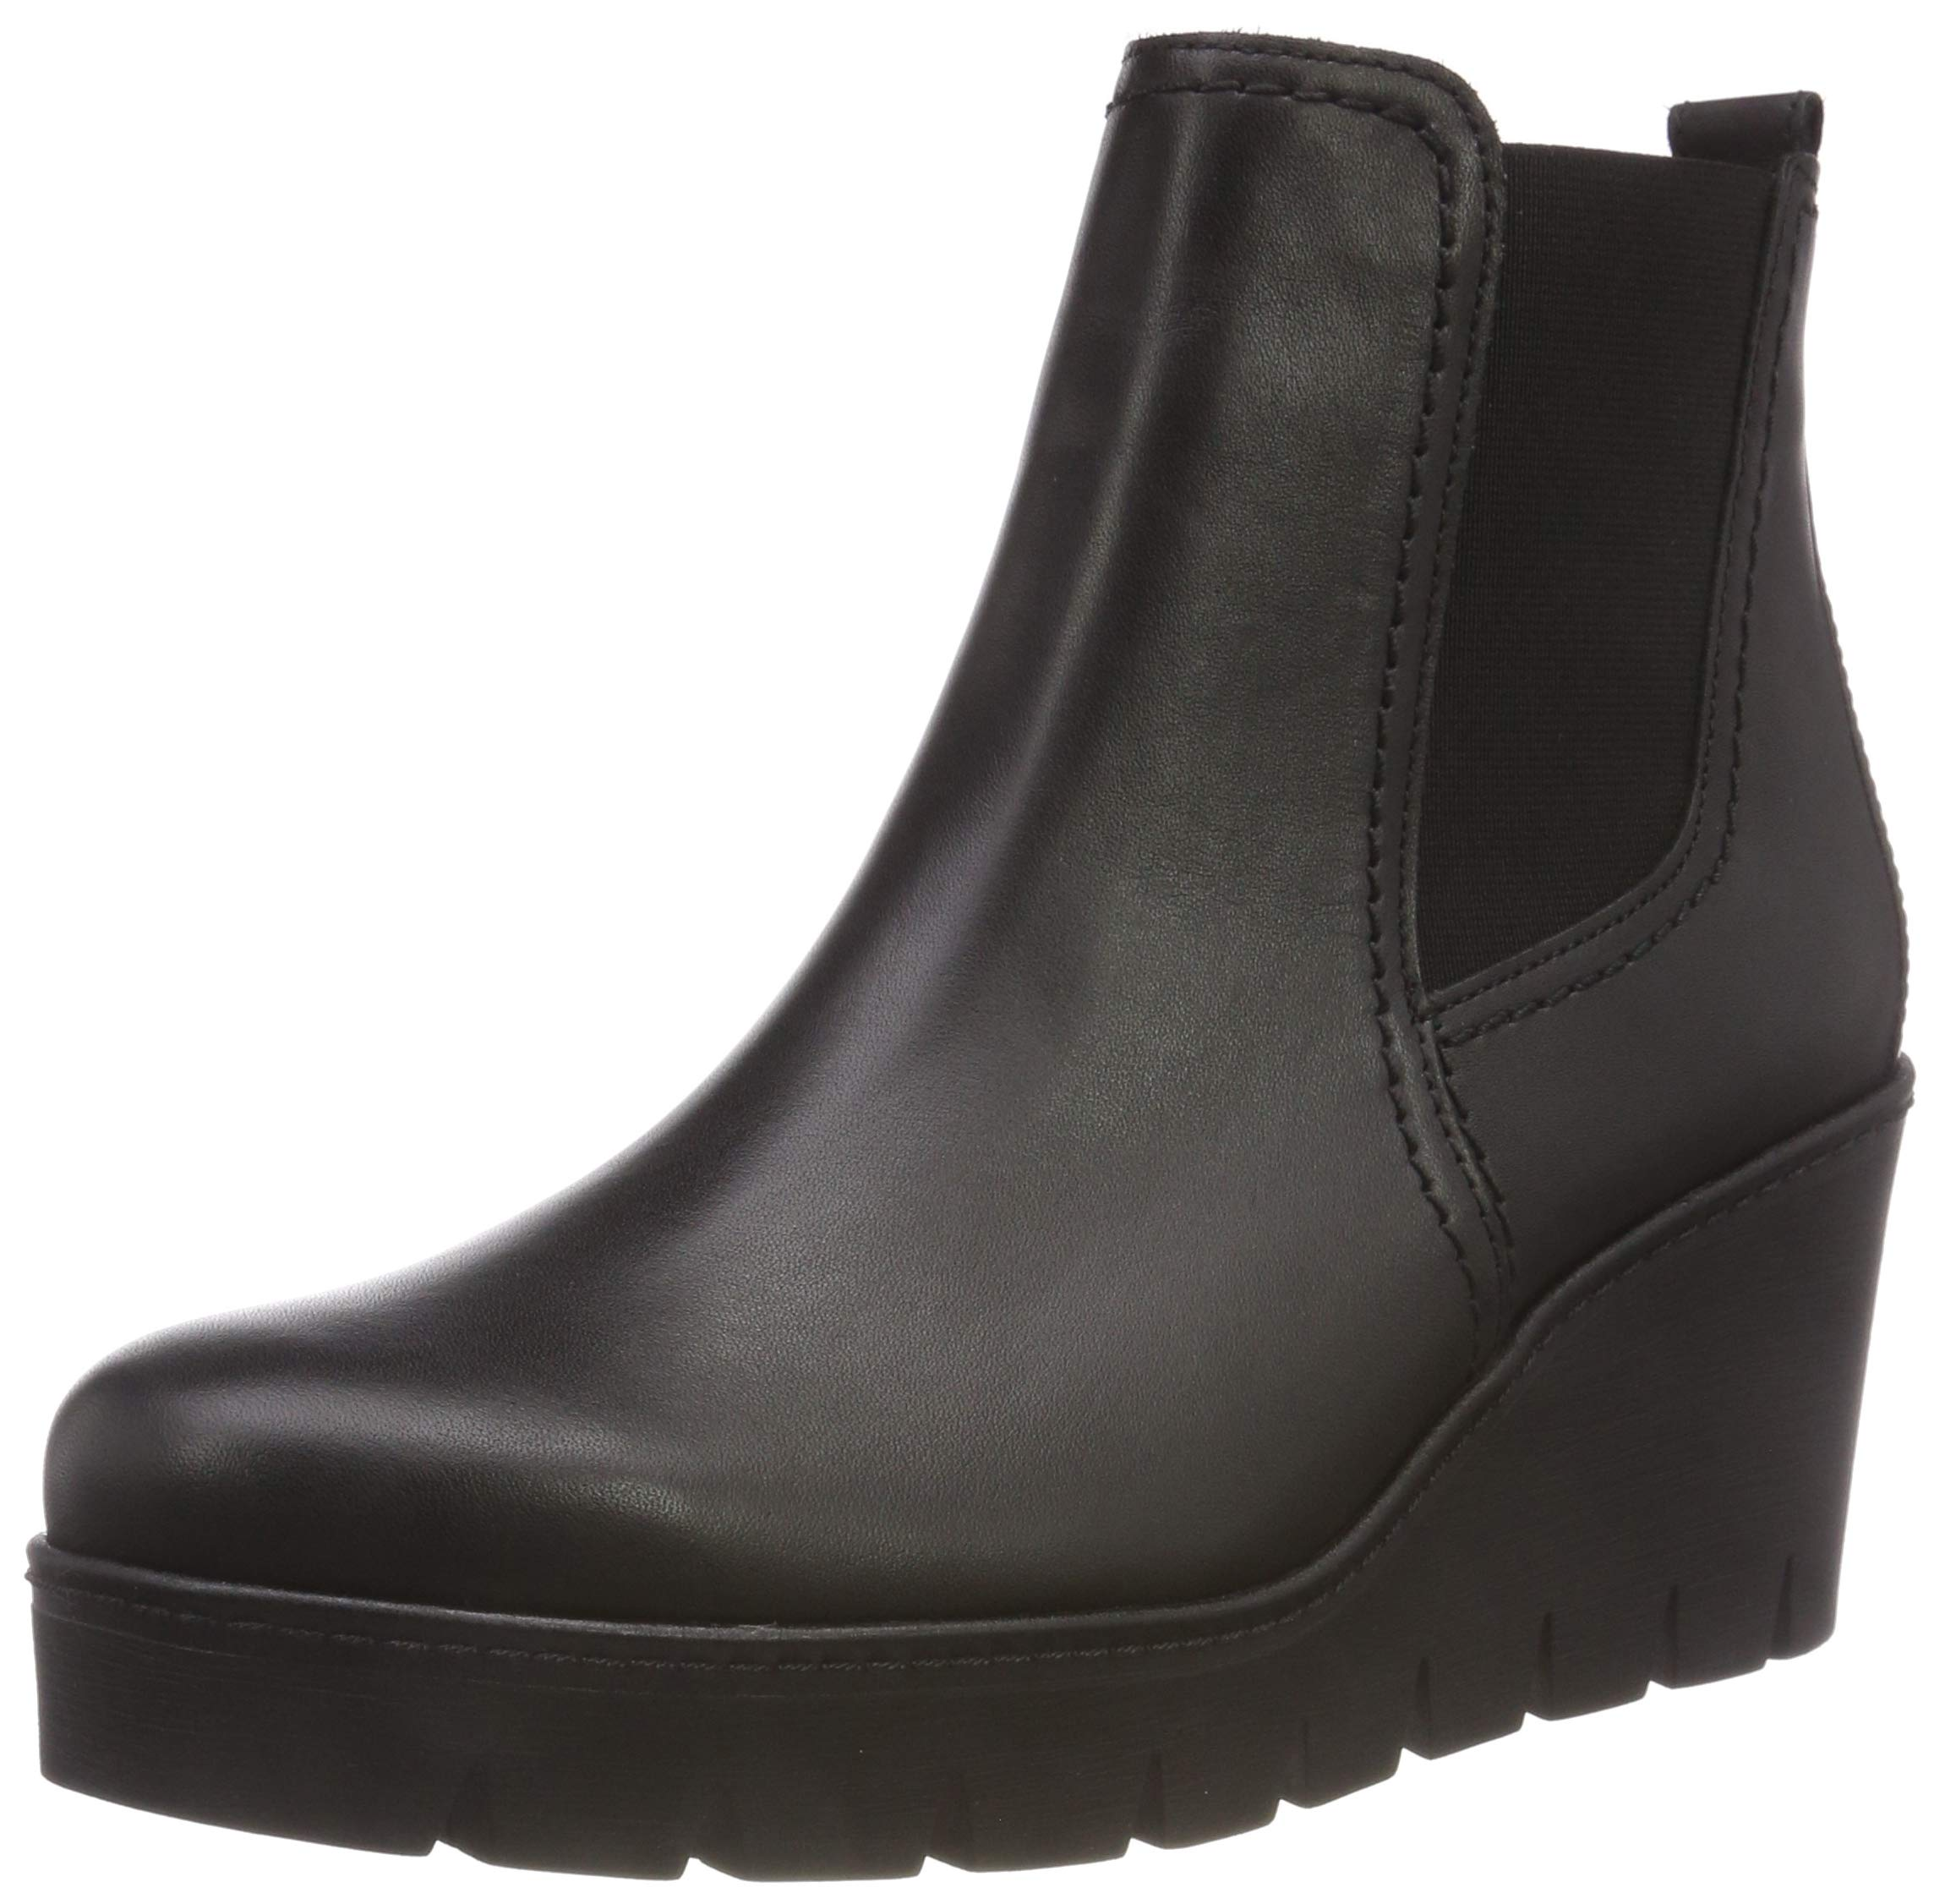 Shoes Eu 5741 FemmeNoirschwarz Gabor JollysBotines eodBCx